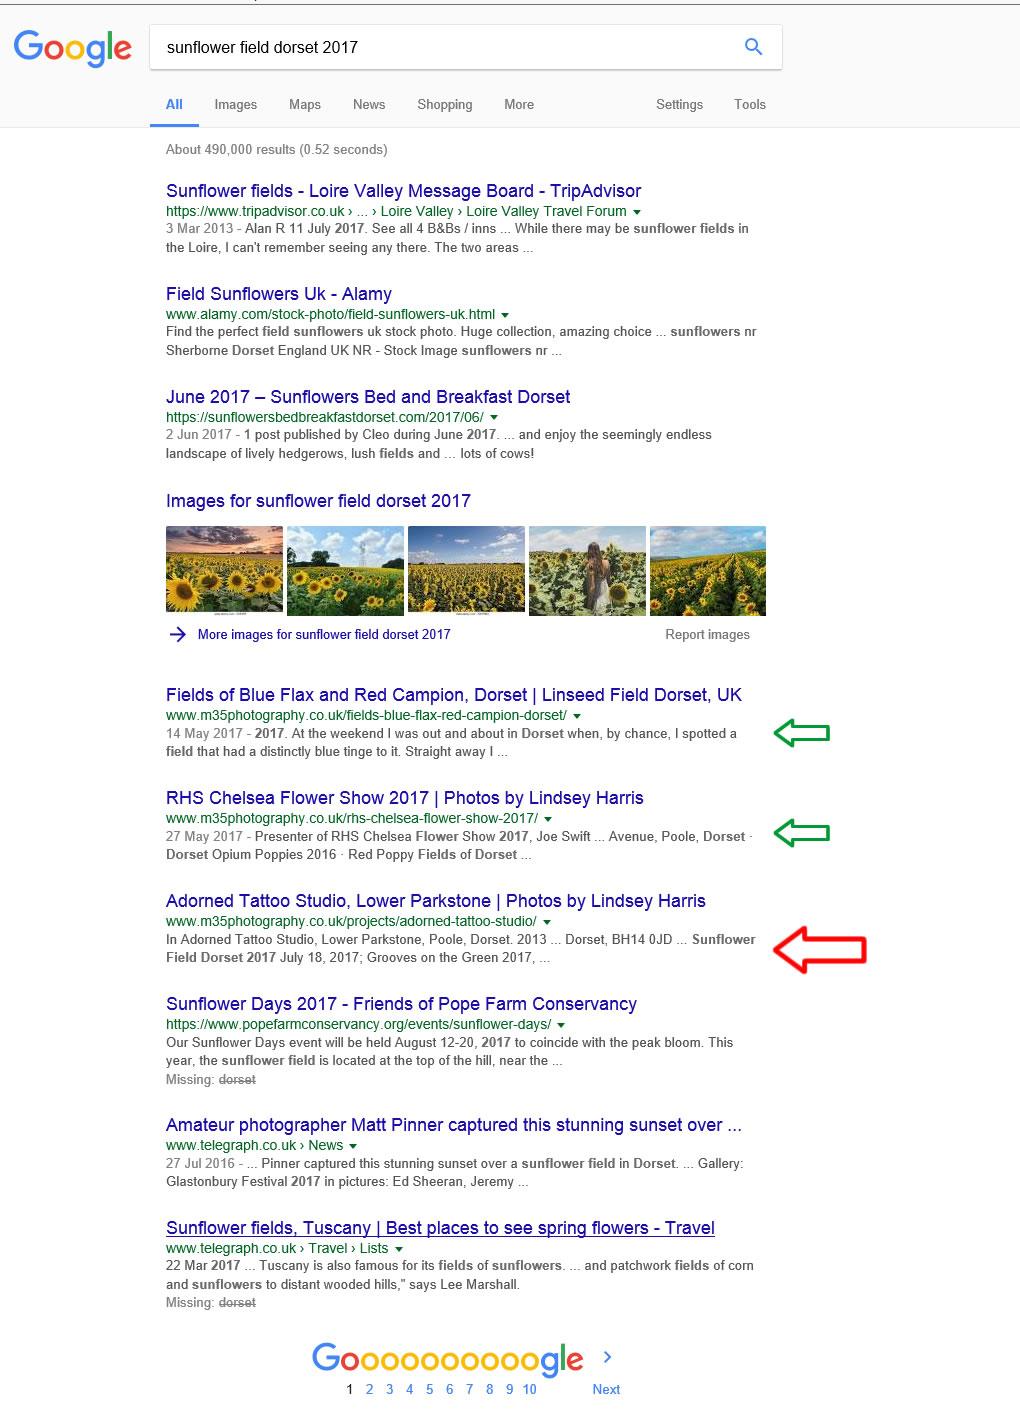 Google screenshot of sunflower search